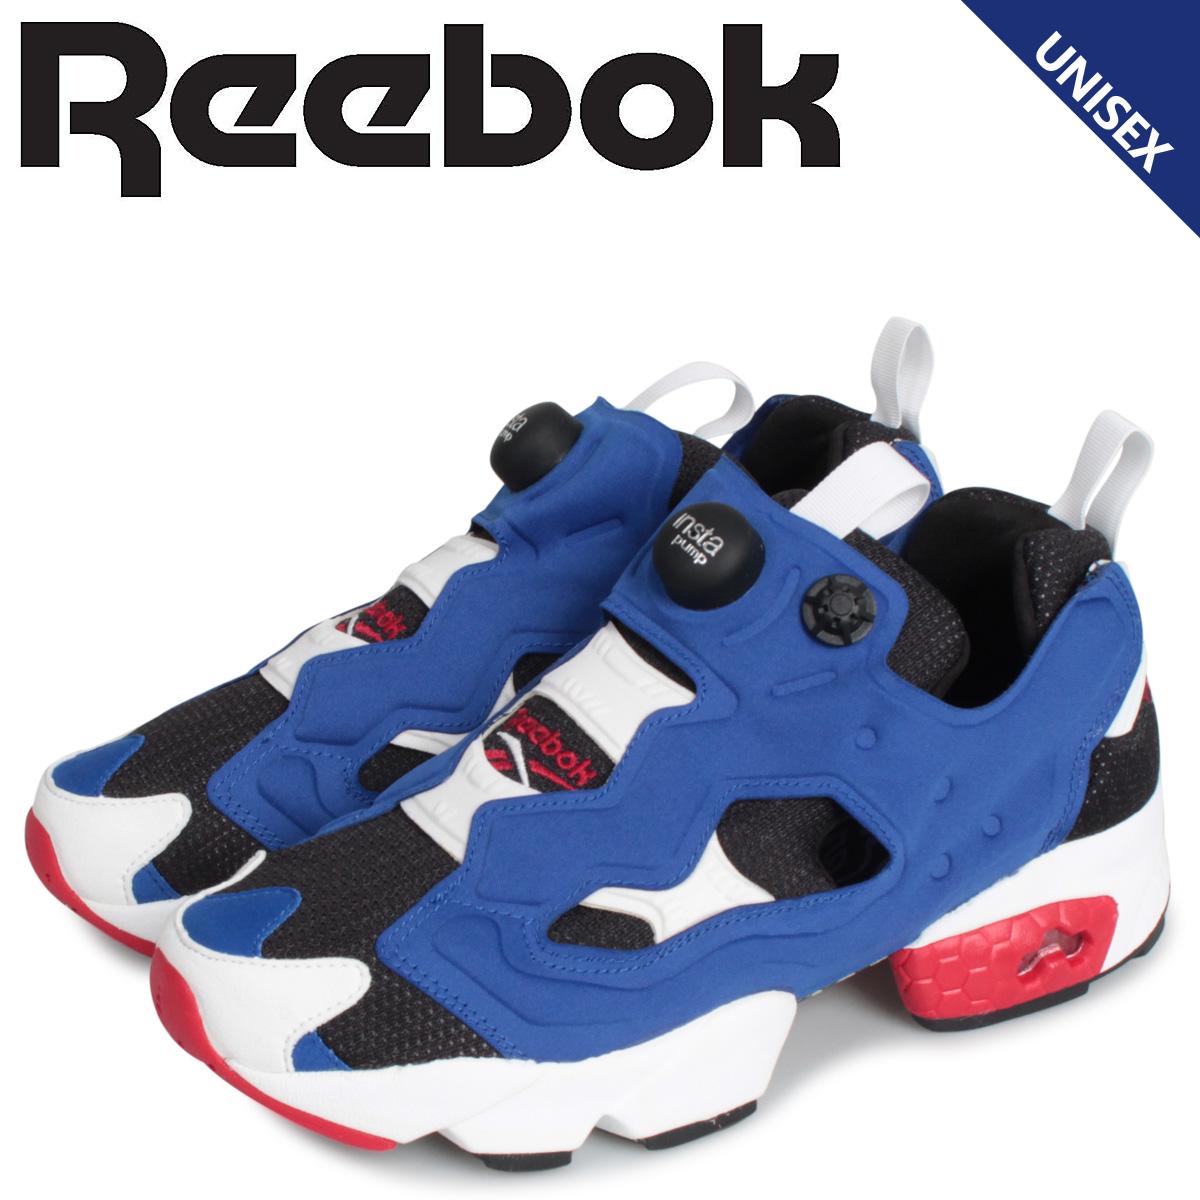 Reebok リーボック インスタ ポンプフューリー スニーカー メンズ レディース INSTAPUMP FURY OG RI ブルー M40934